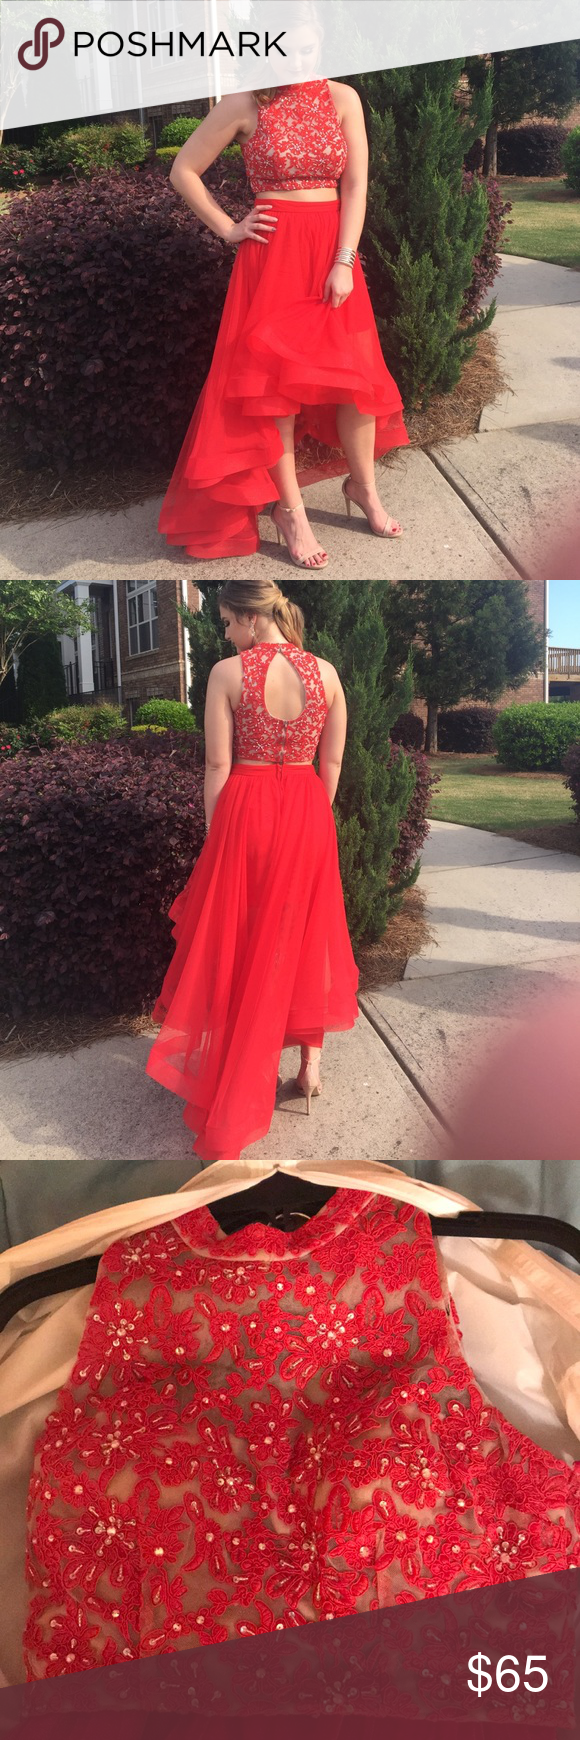 Red piece prom dress